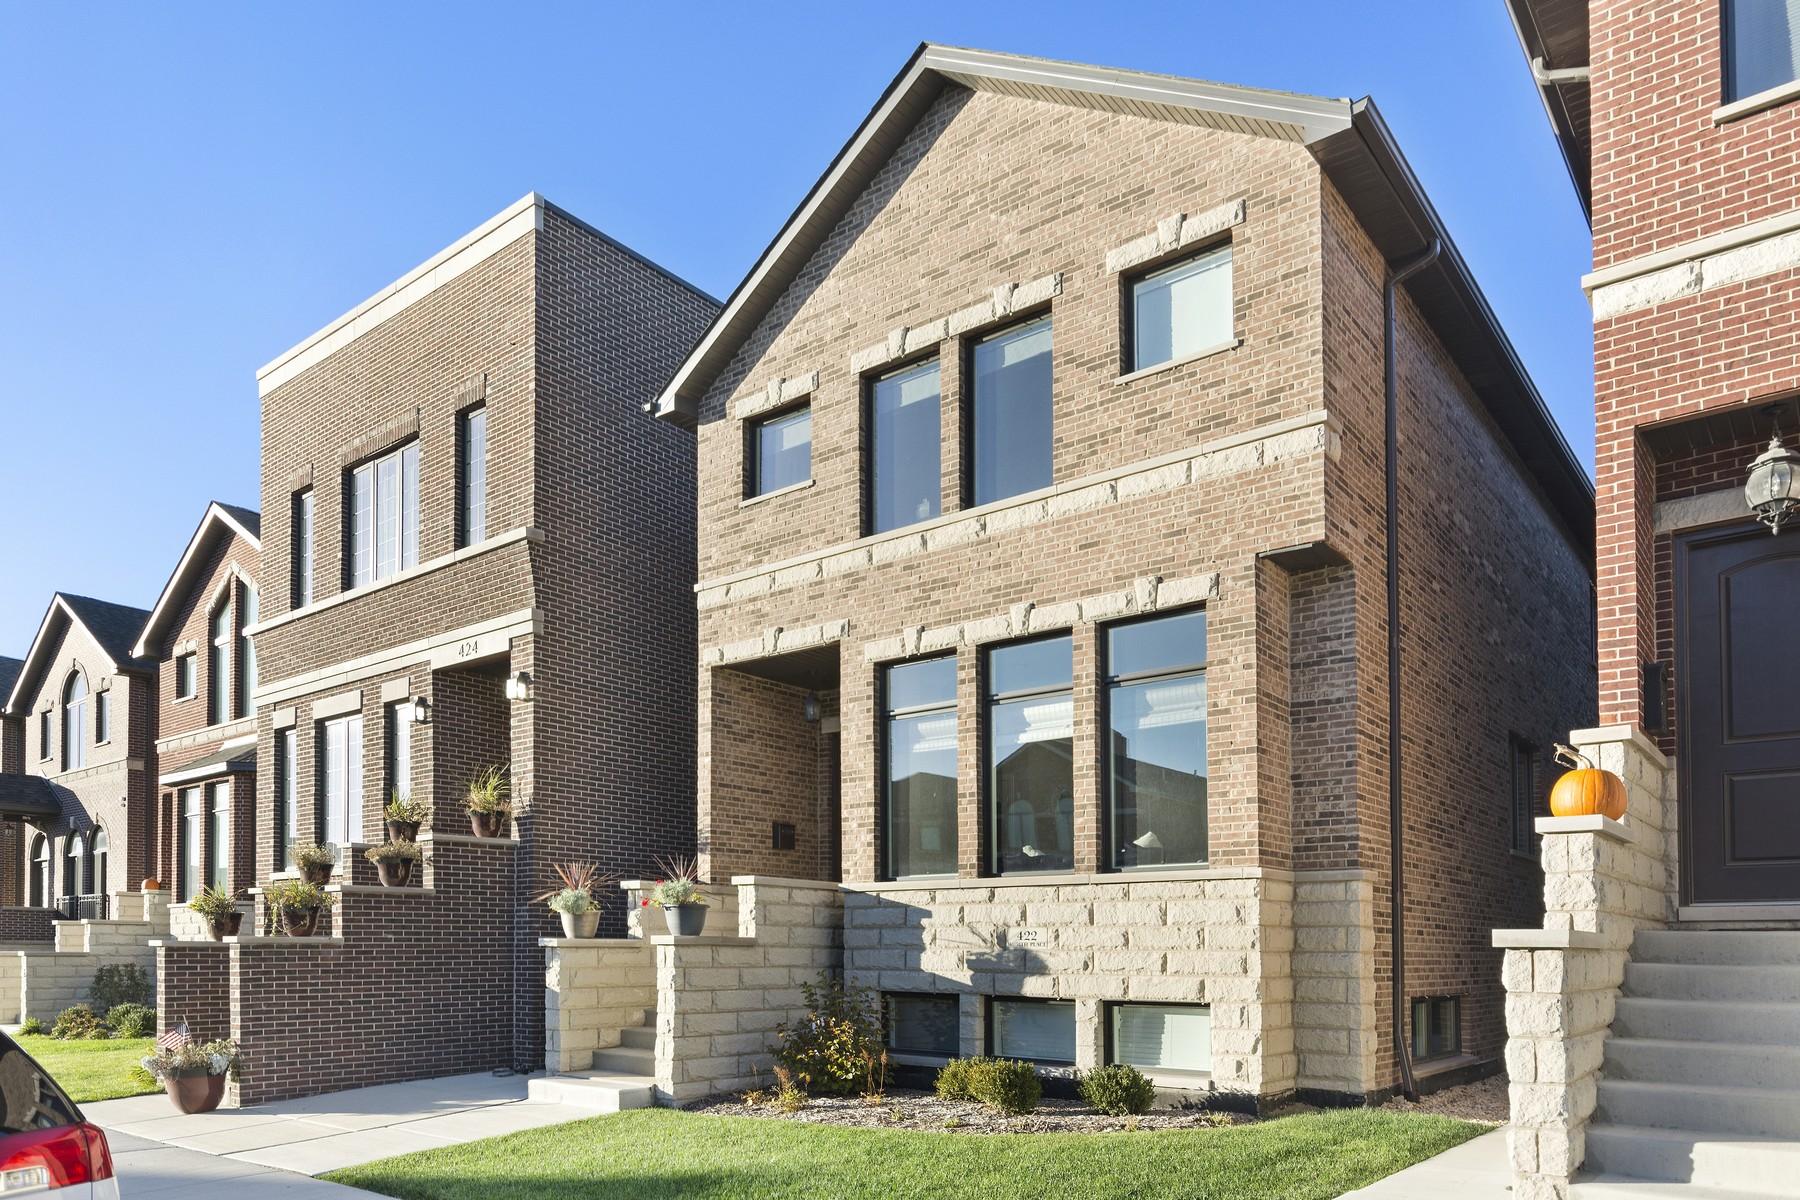 独户住宅 为 销售 在 Stunning New Home at Bridgeport Collection! 422 W 38th Place Bridgeport, 芝加哥, 伊利诺斯州, 60609 美国